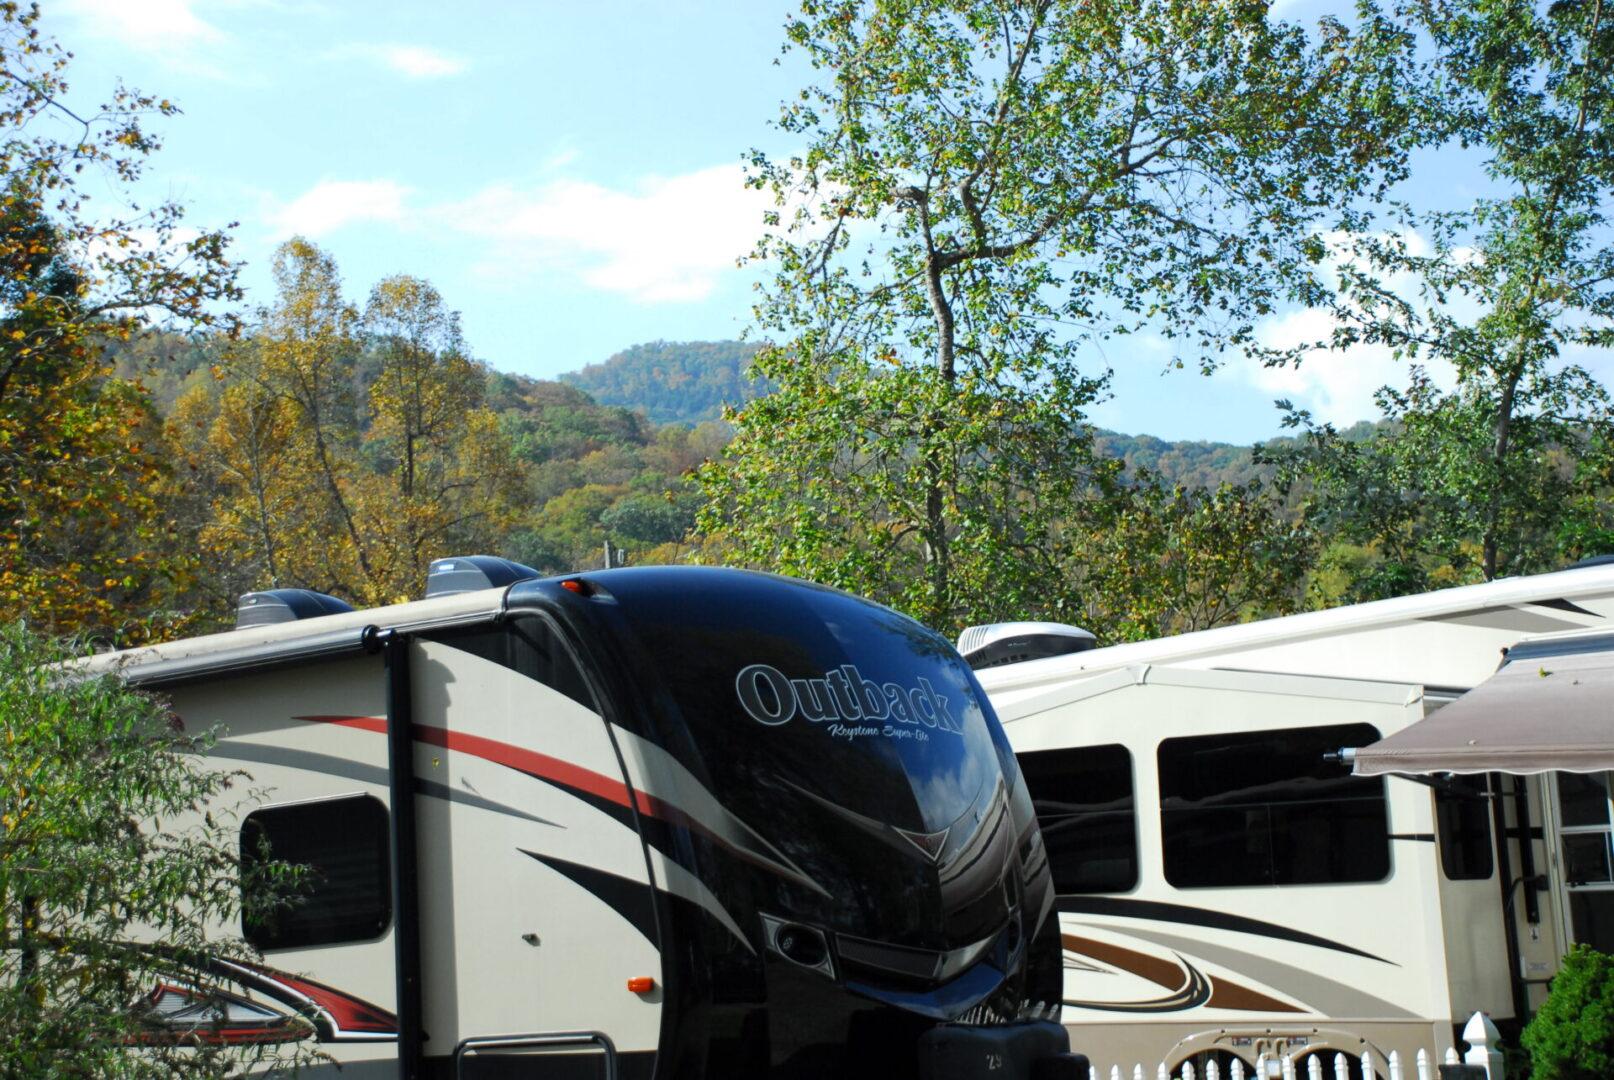 Outback trailer beside a white RV